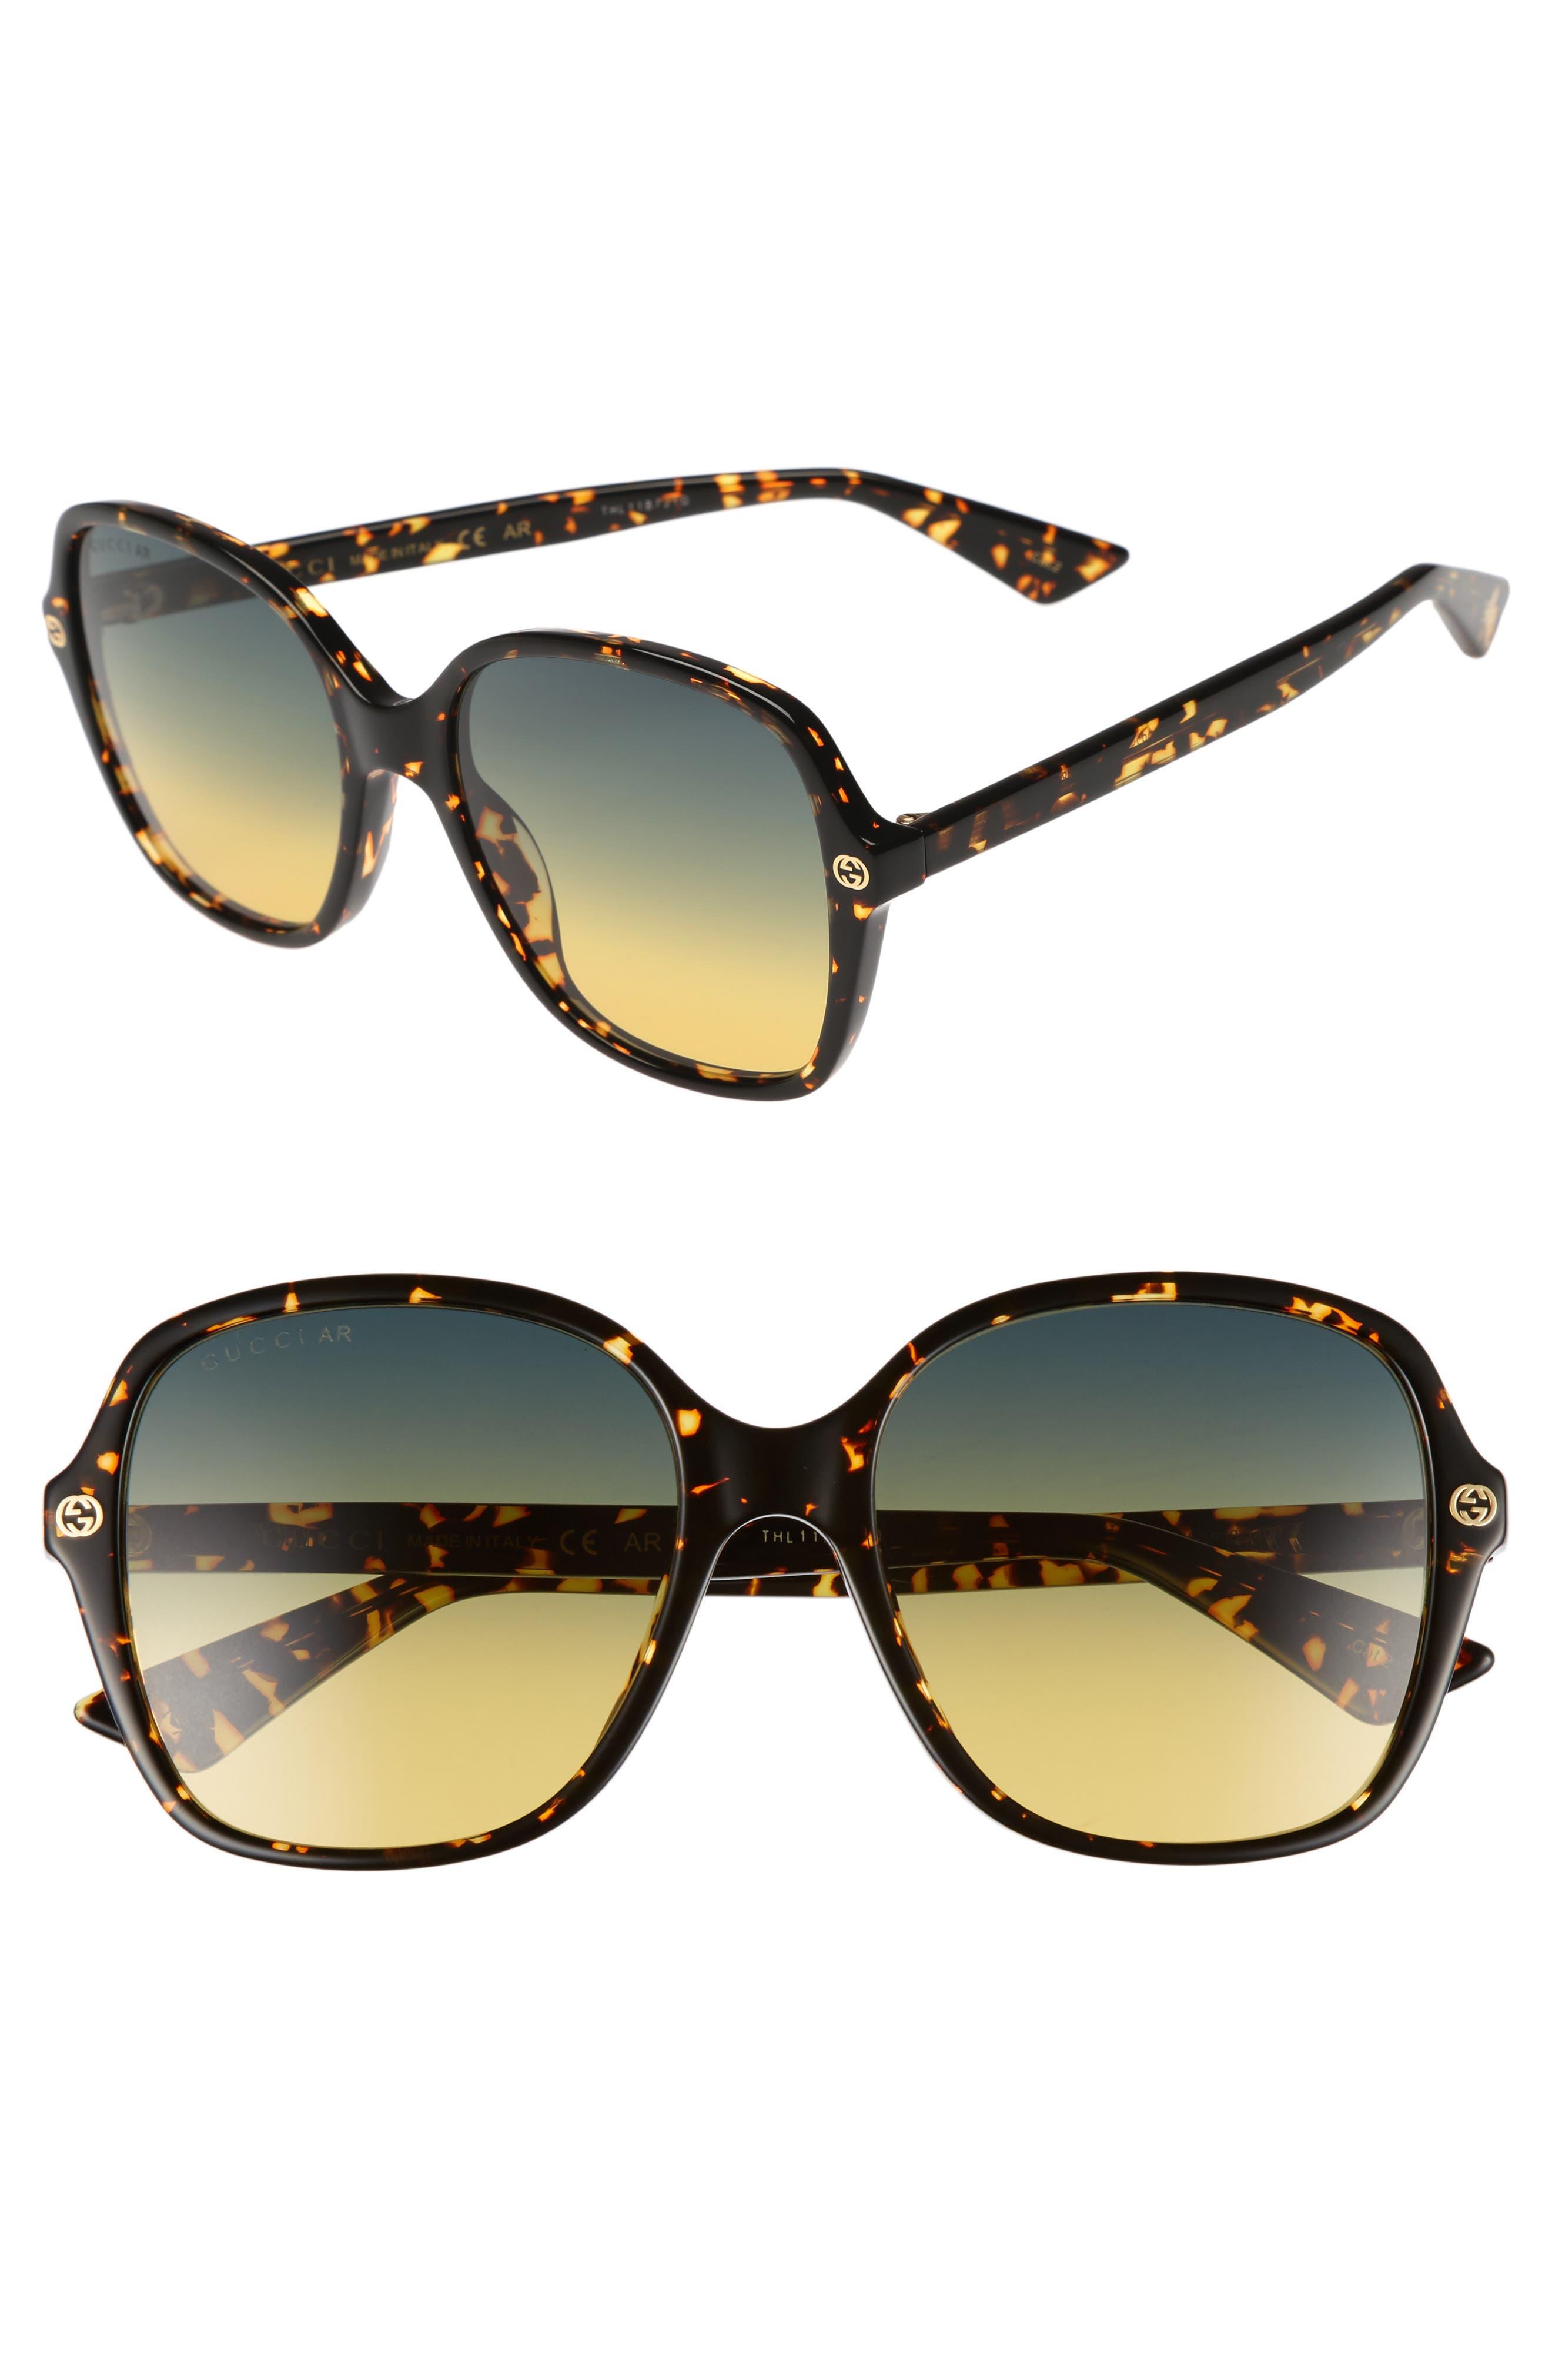 Gucci 55mm Gradient Sunglasses